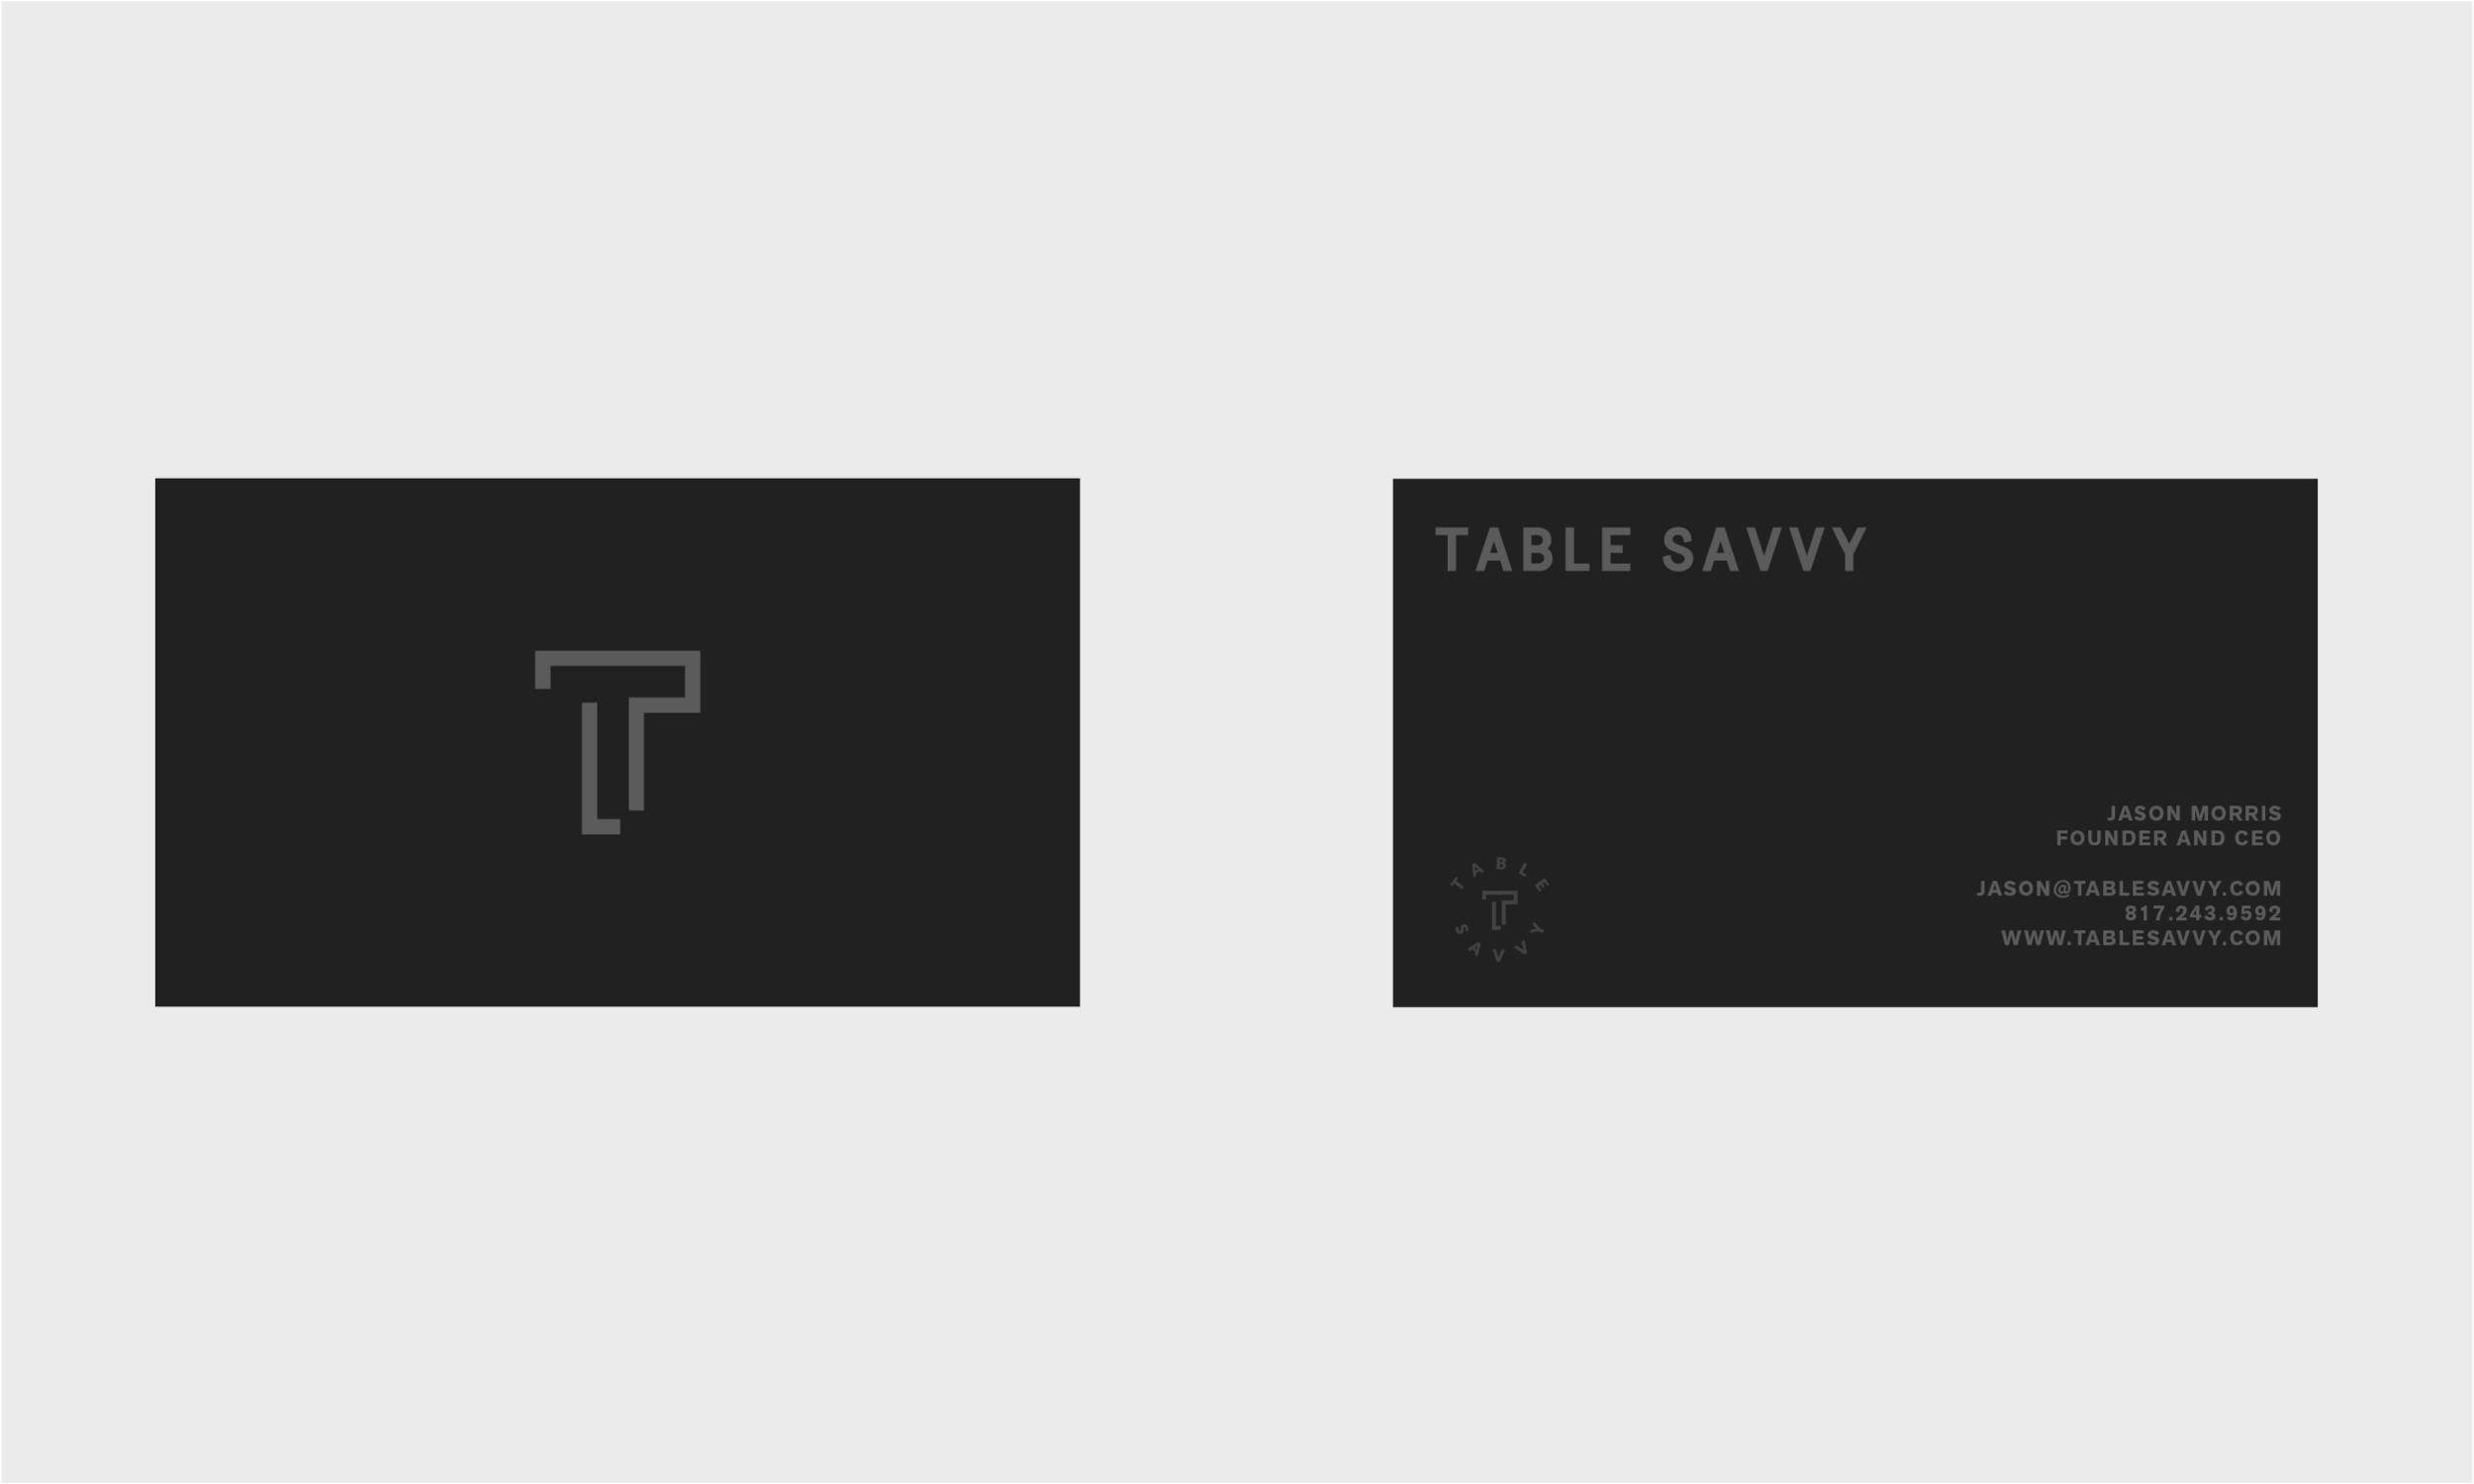 ts_card-2.png